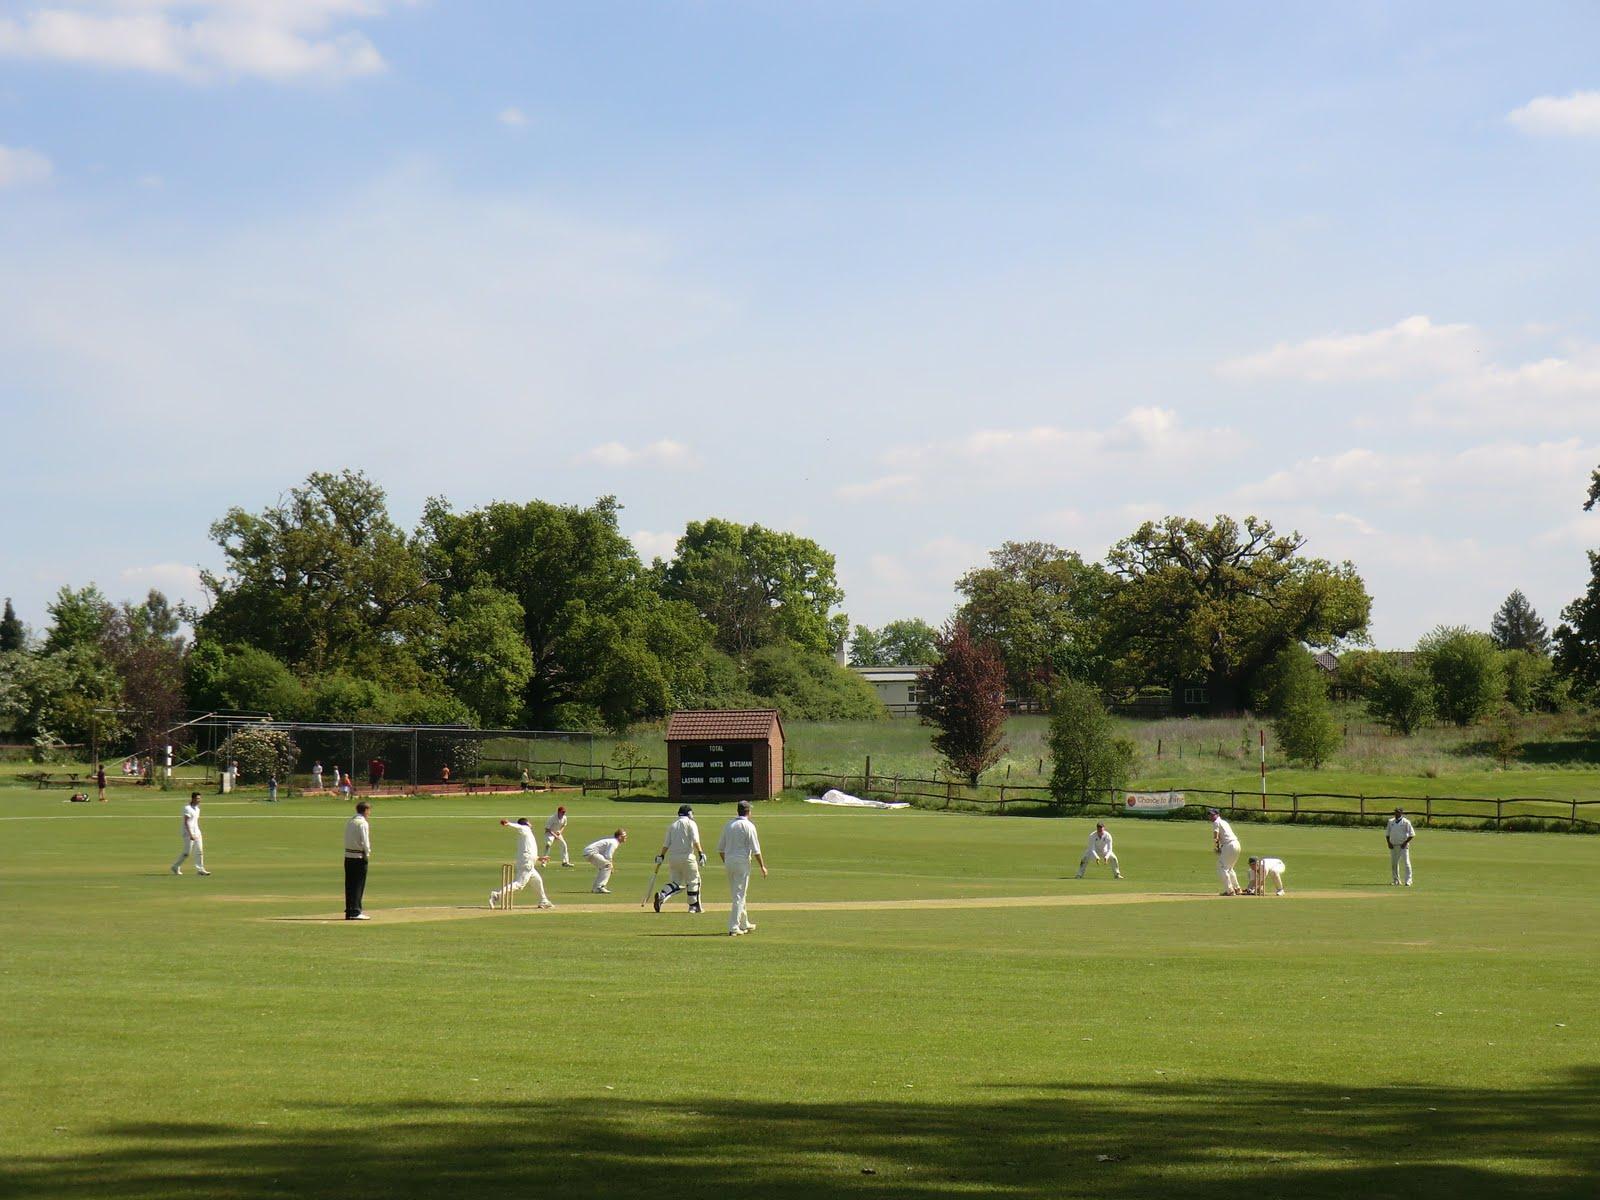 CIMG6822 Merstham Cricket Club